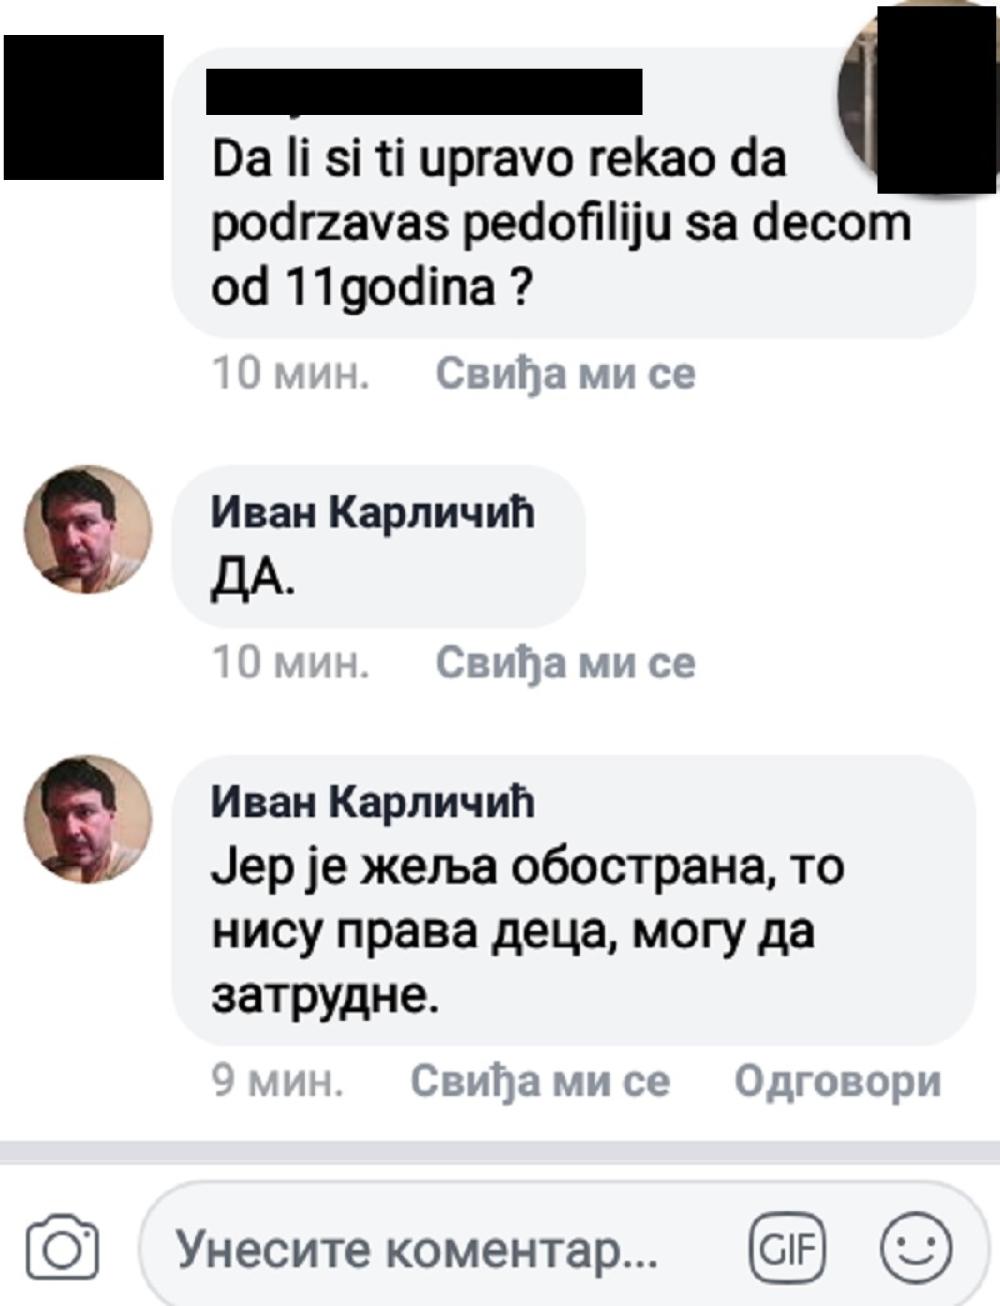 Karličićeva prepiska